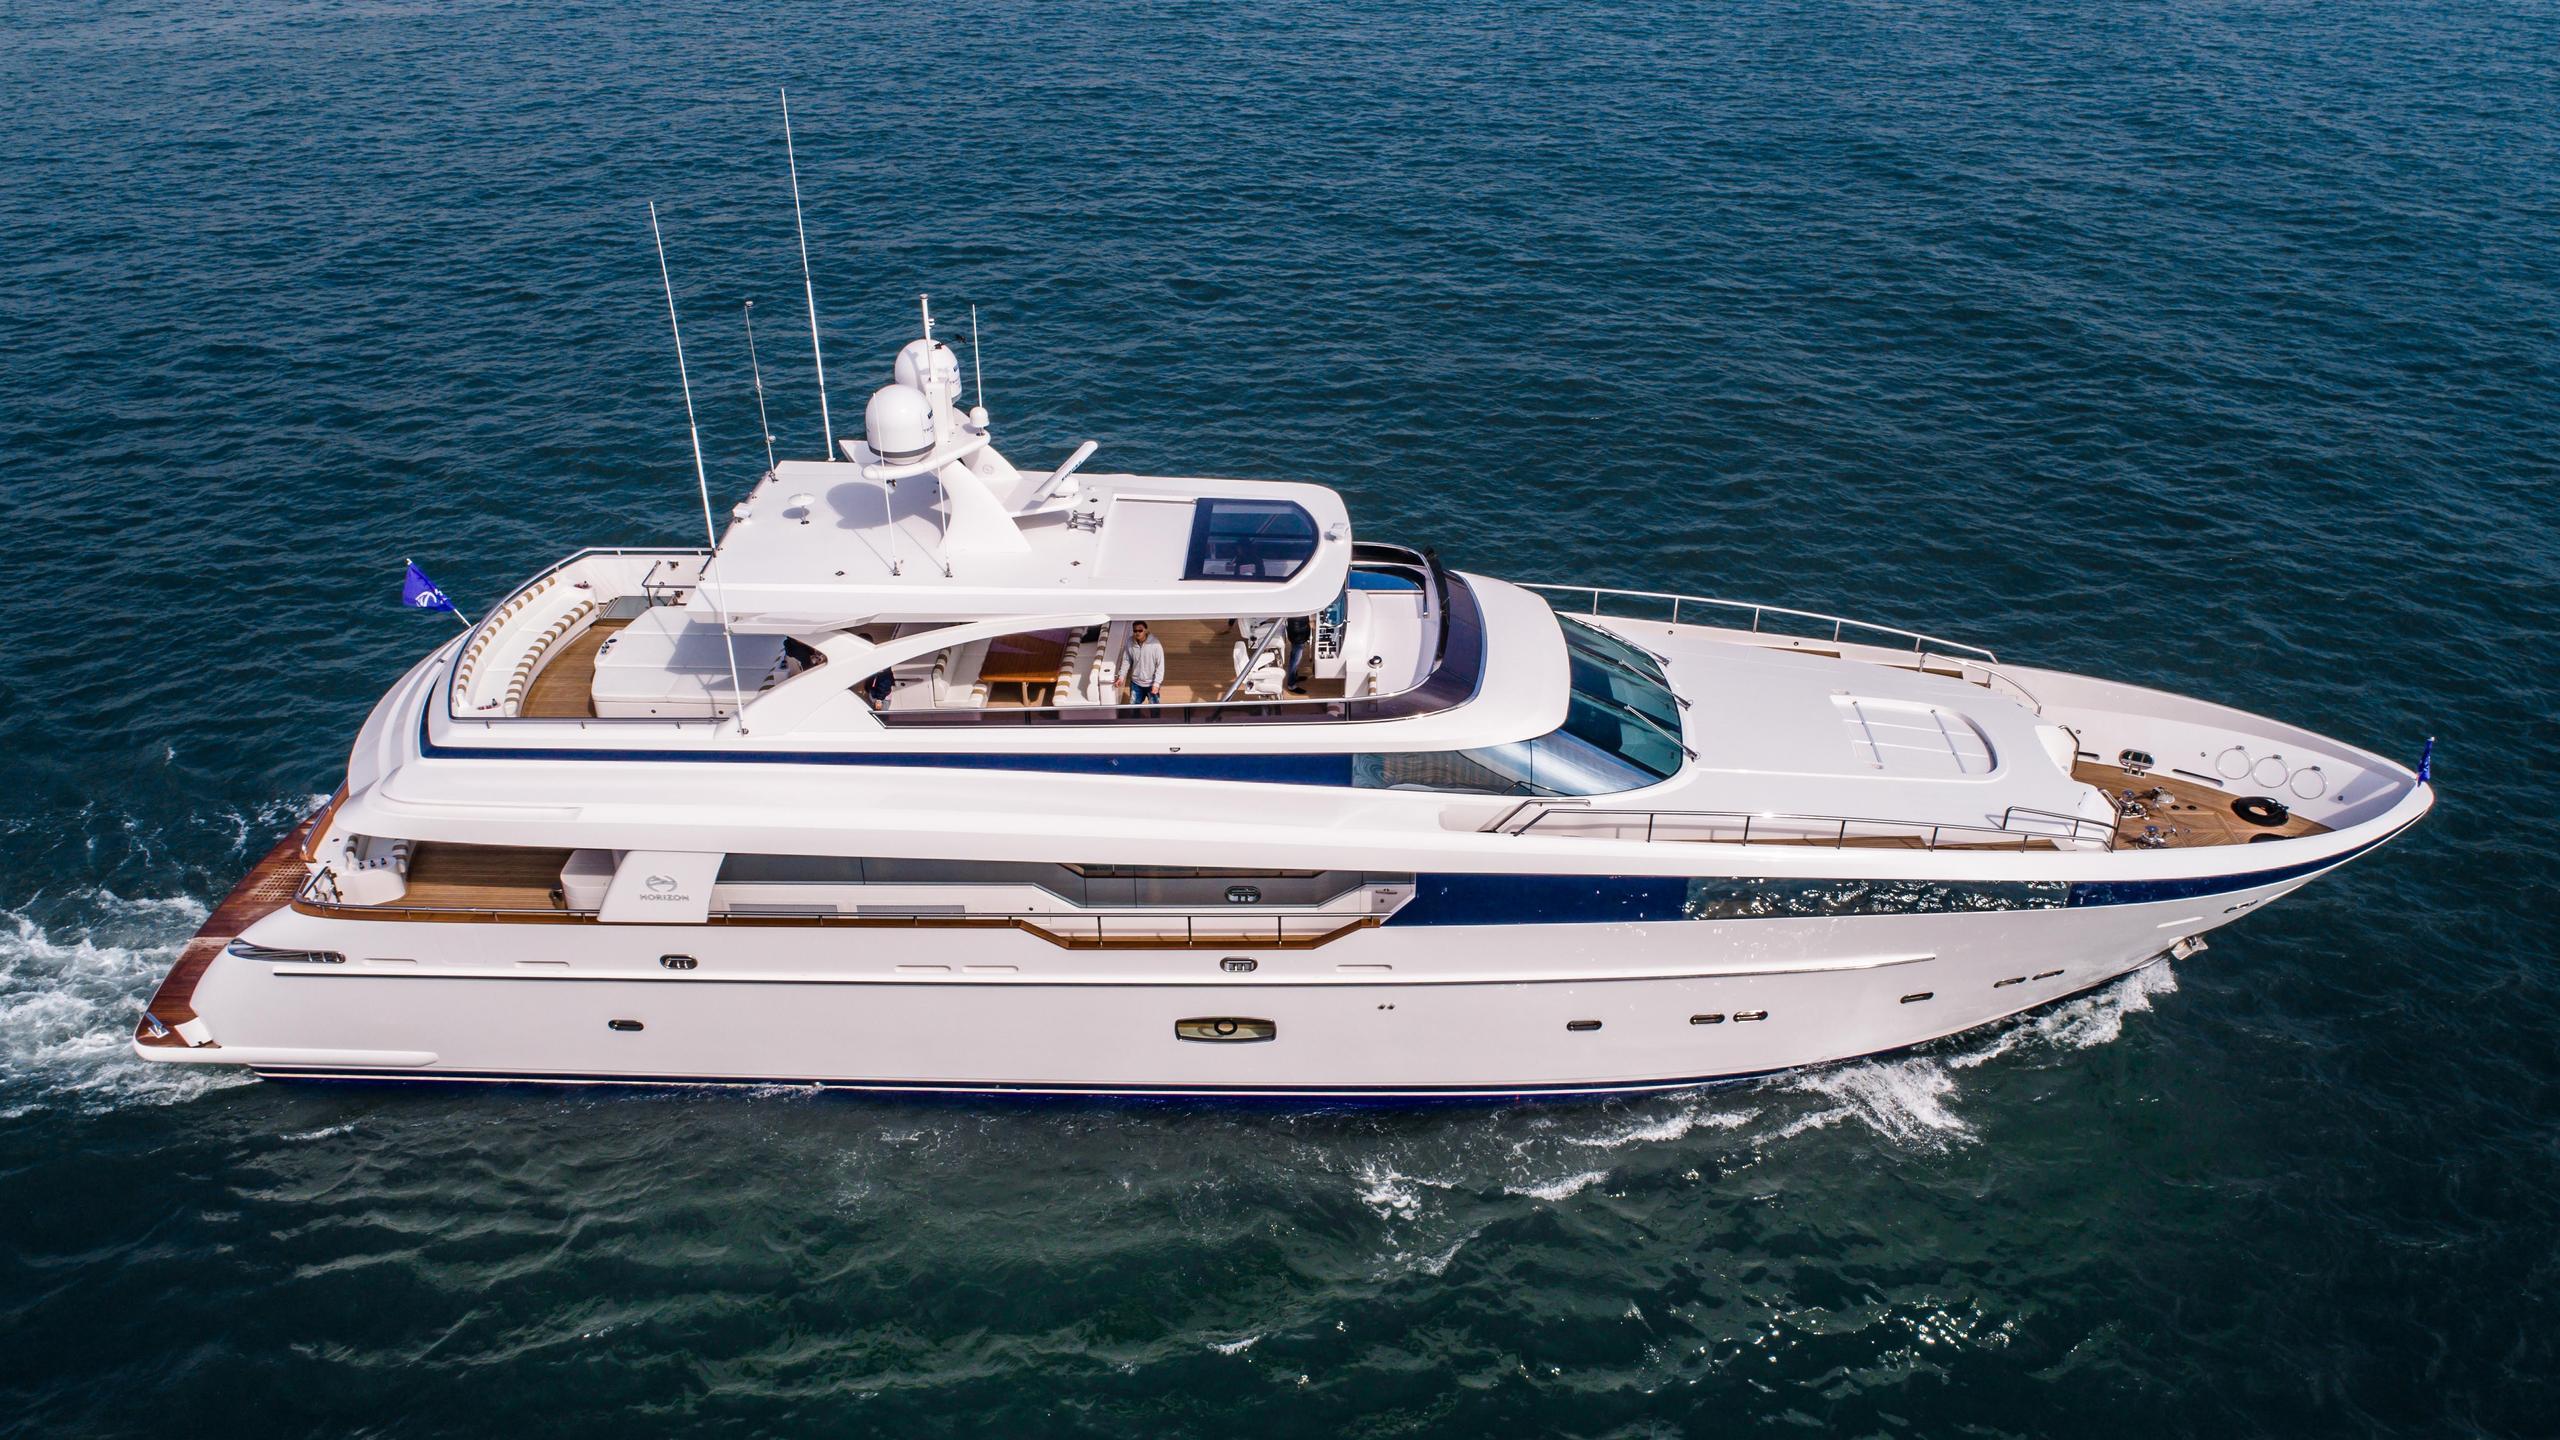 abaco motoryacht horizon rp110 2017 33m profile